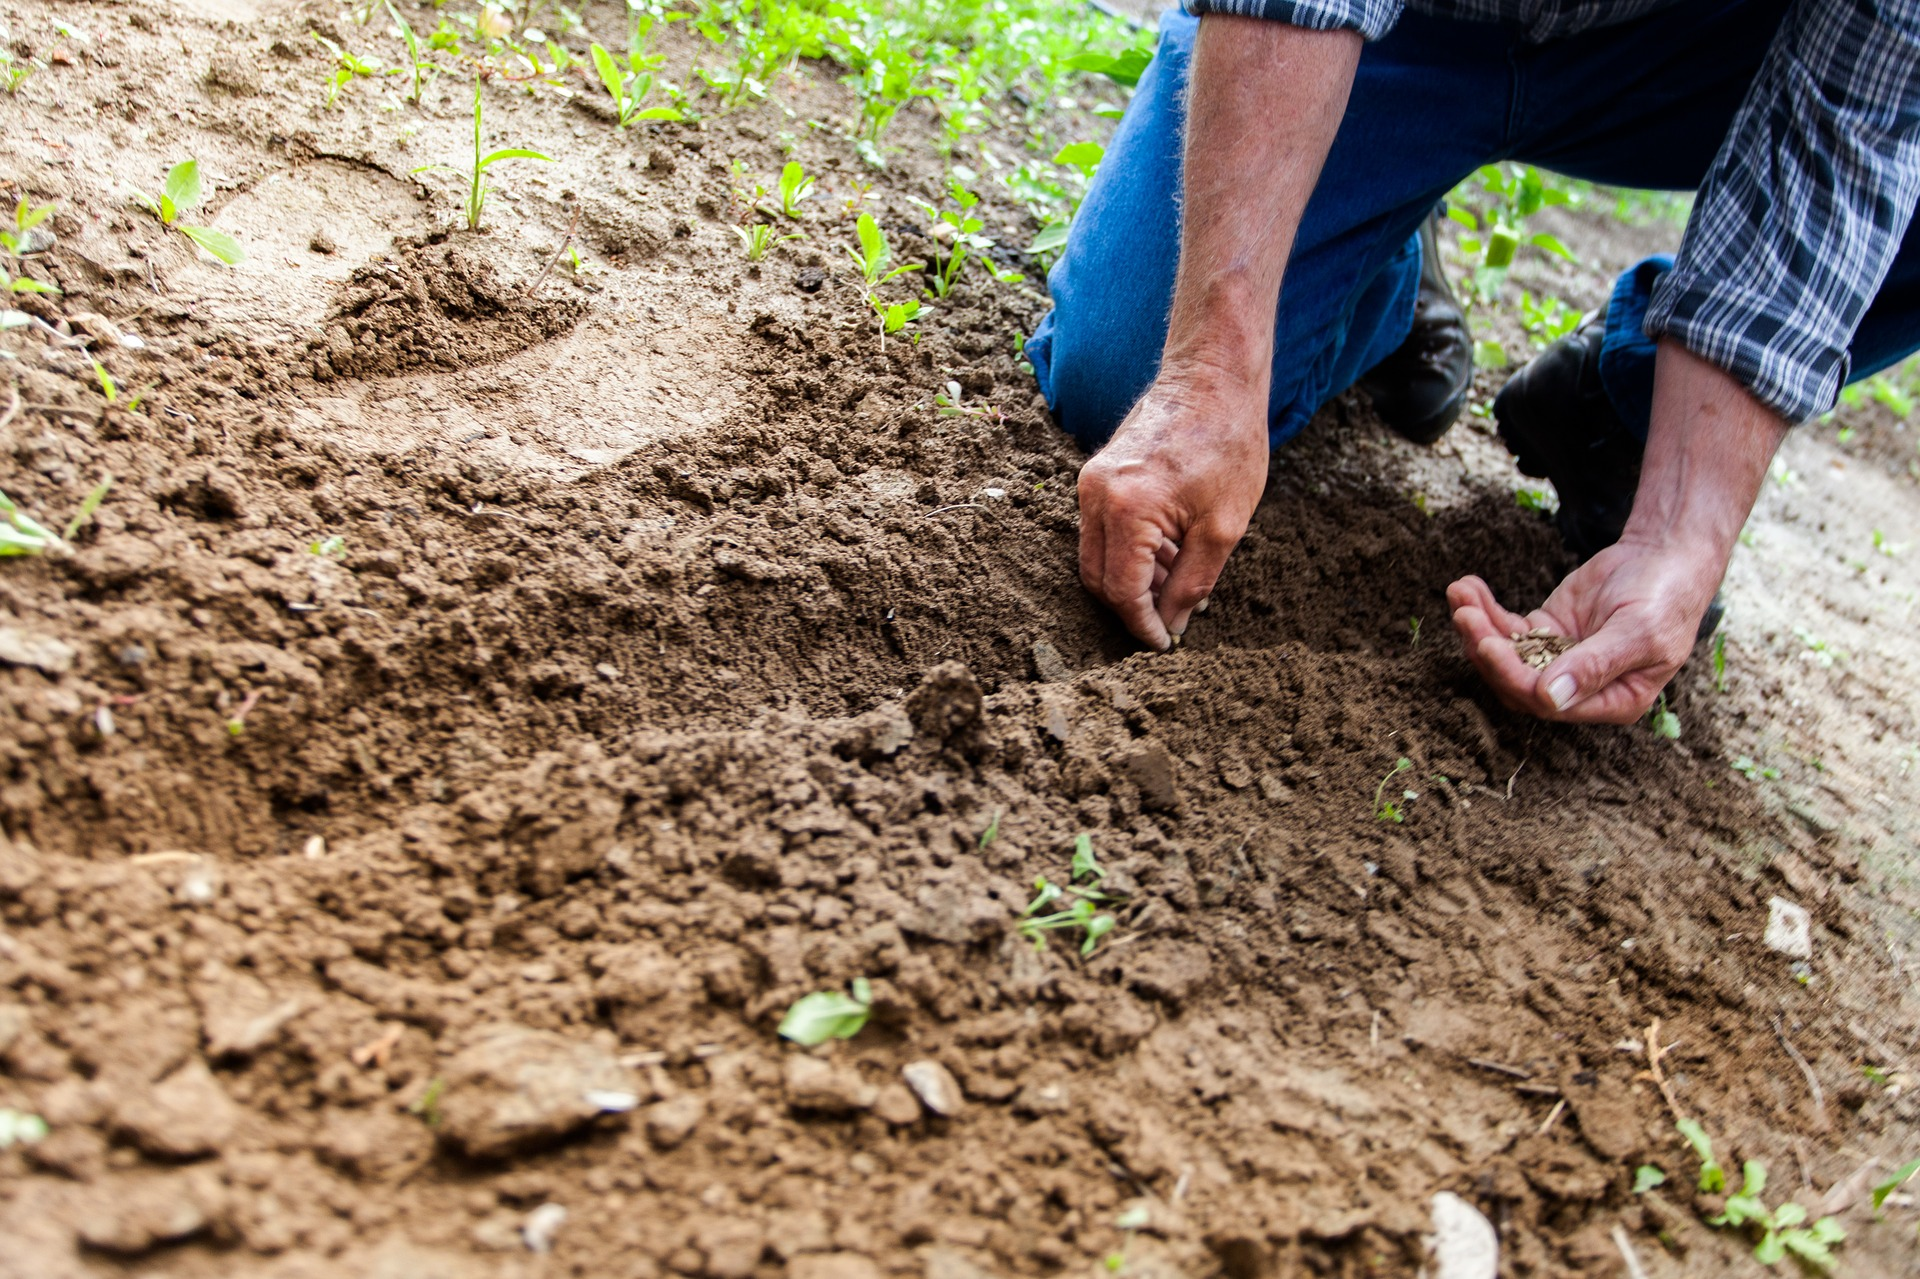 soil 2561136 1920 - Η σημασία της Εδαφολογικής Ανάλυσης